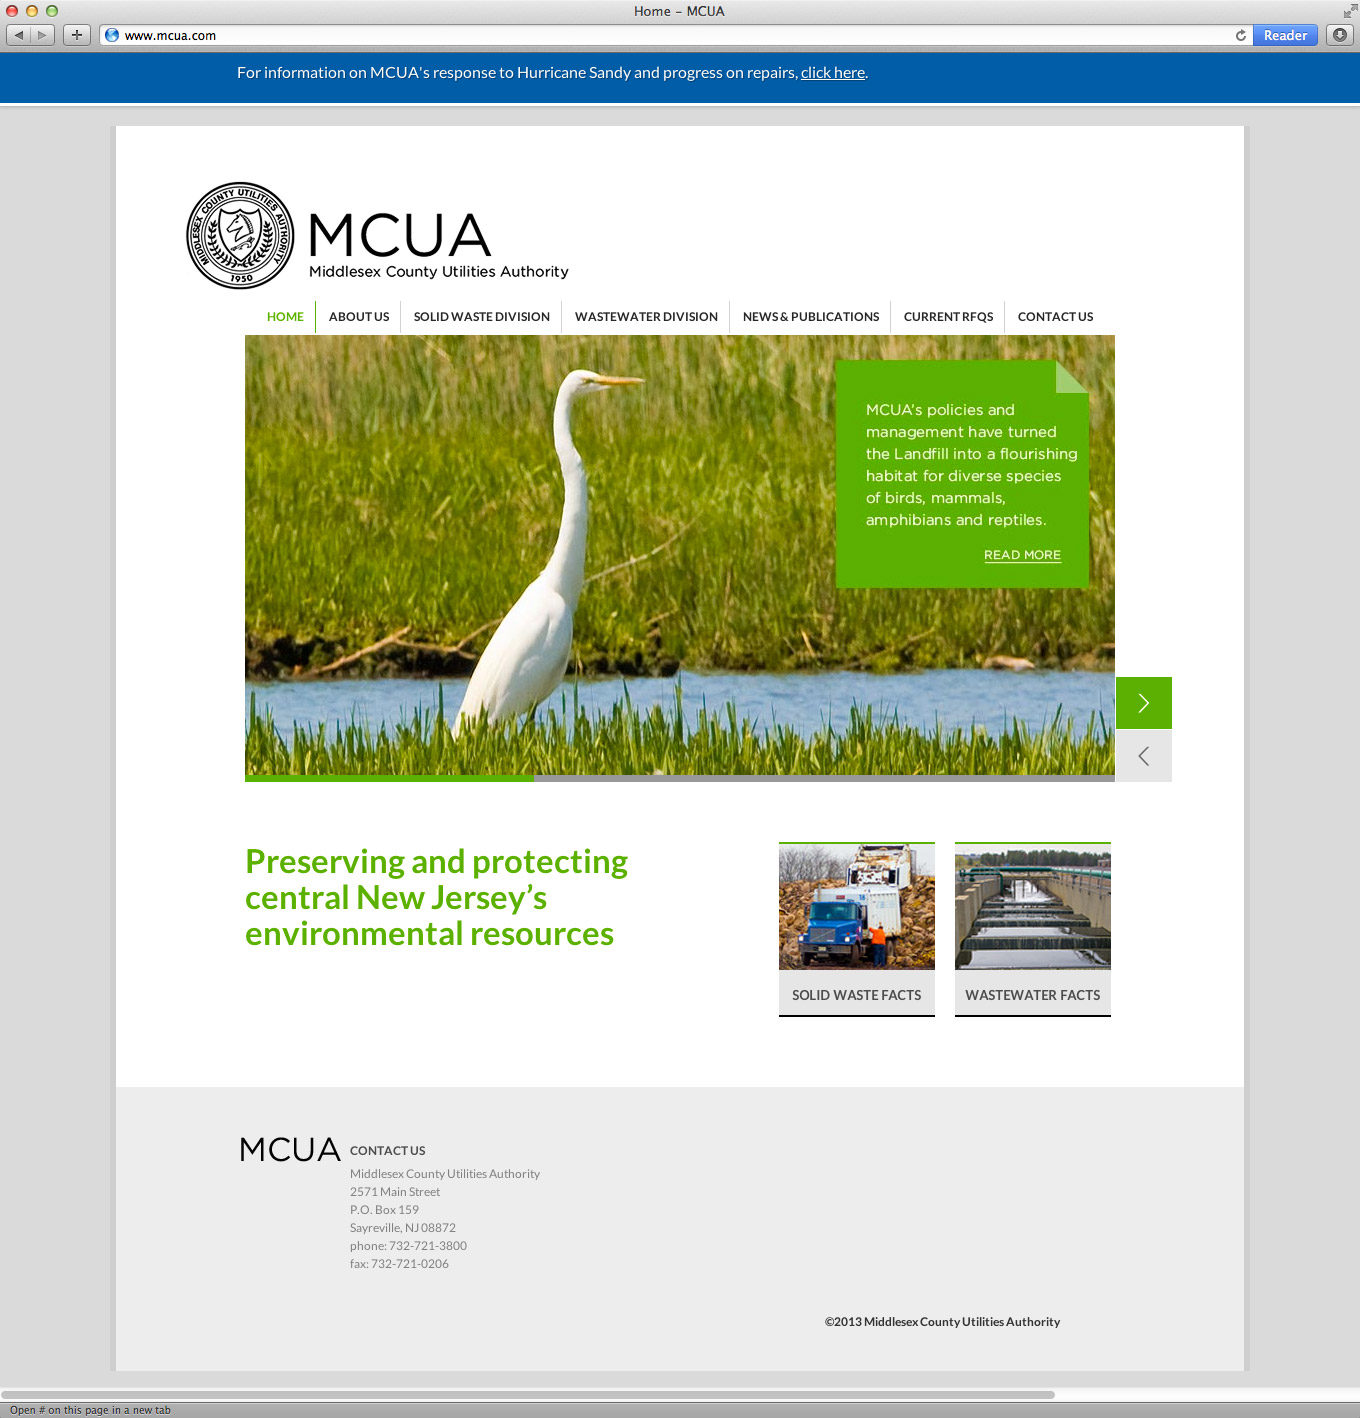 MCUA_homepage